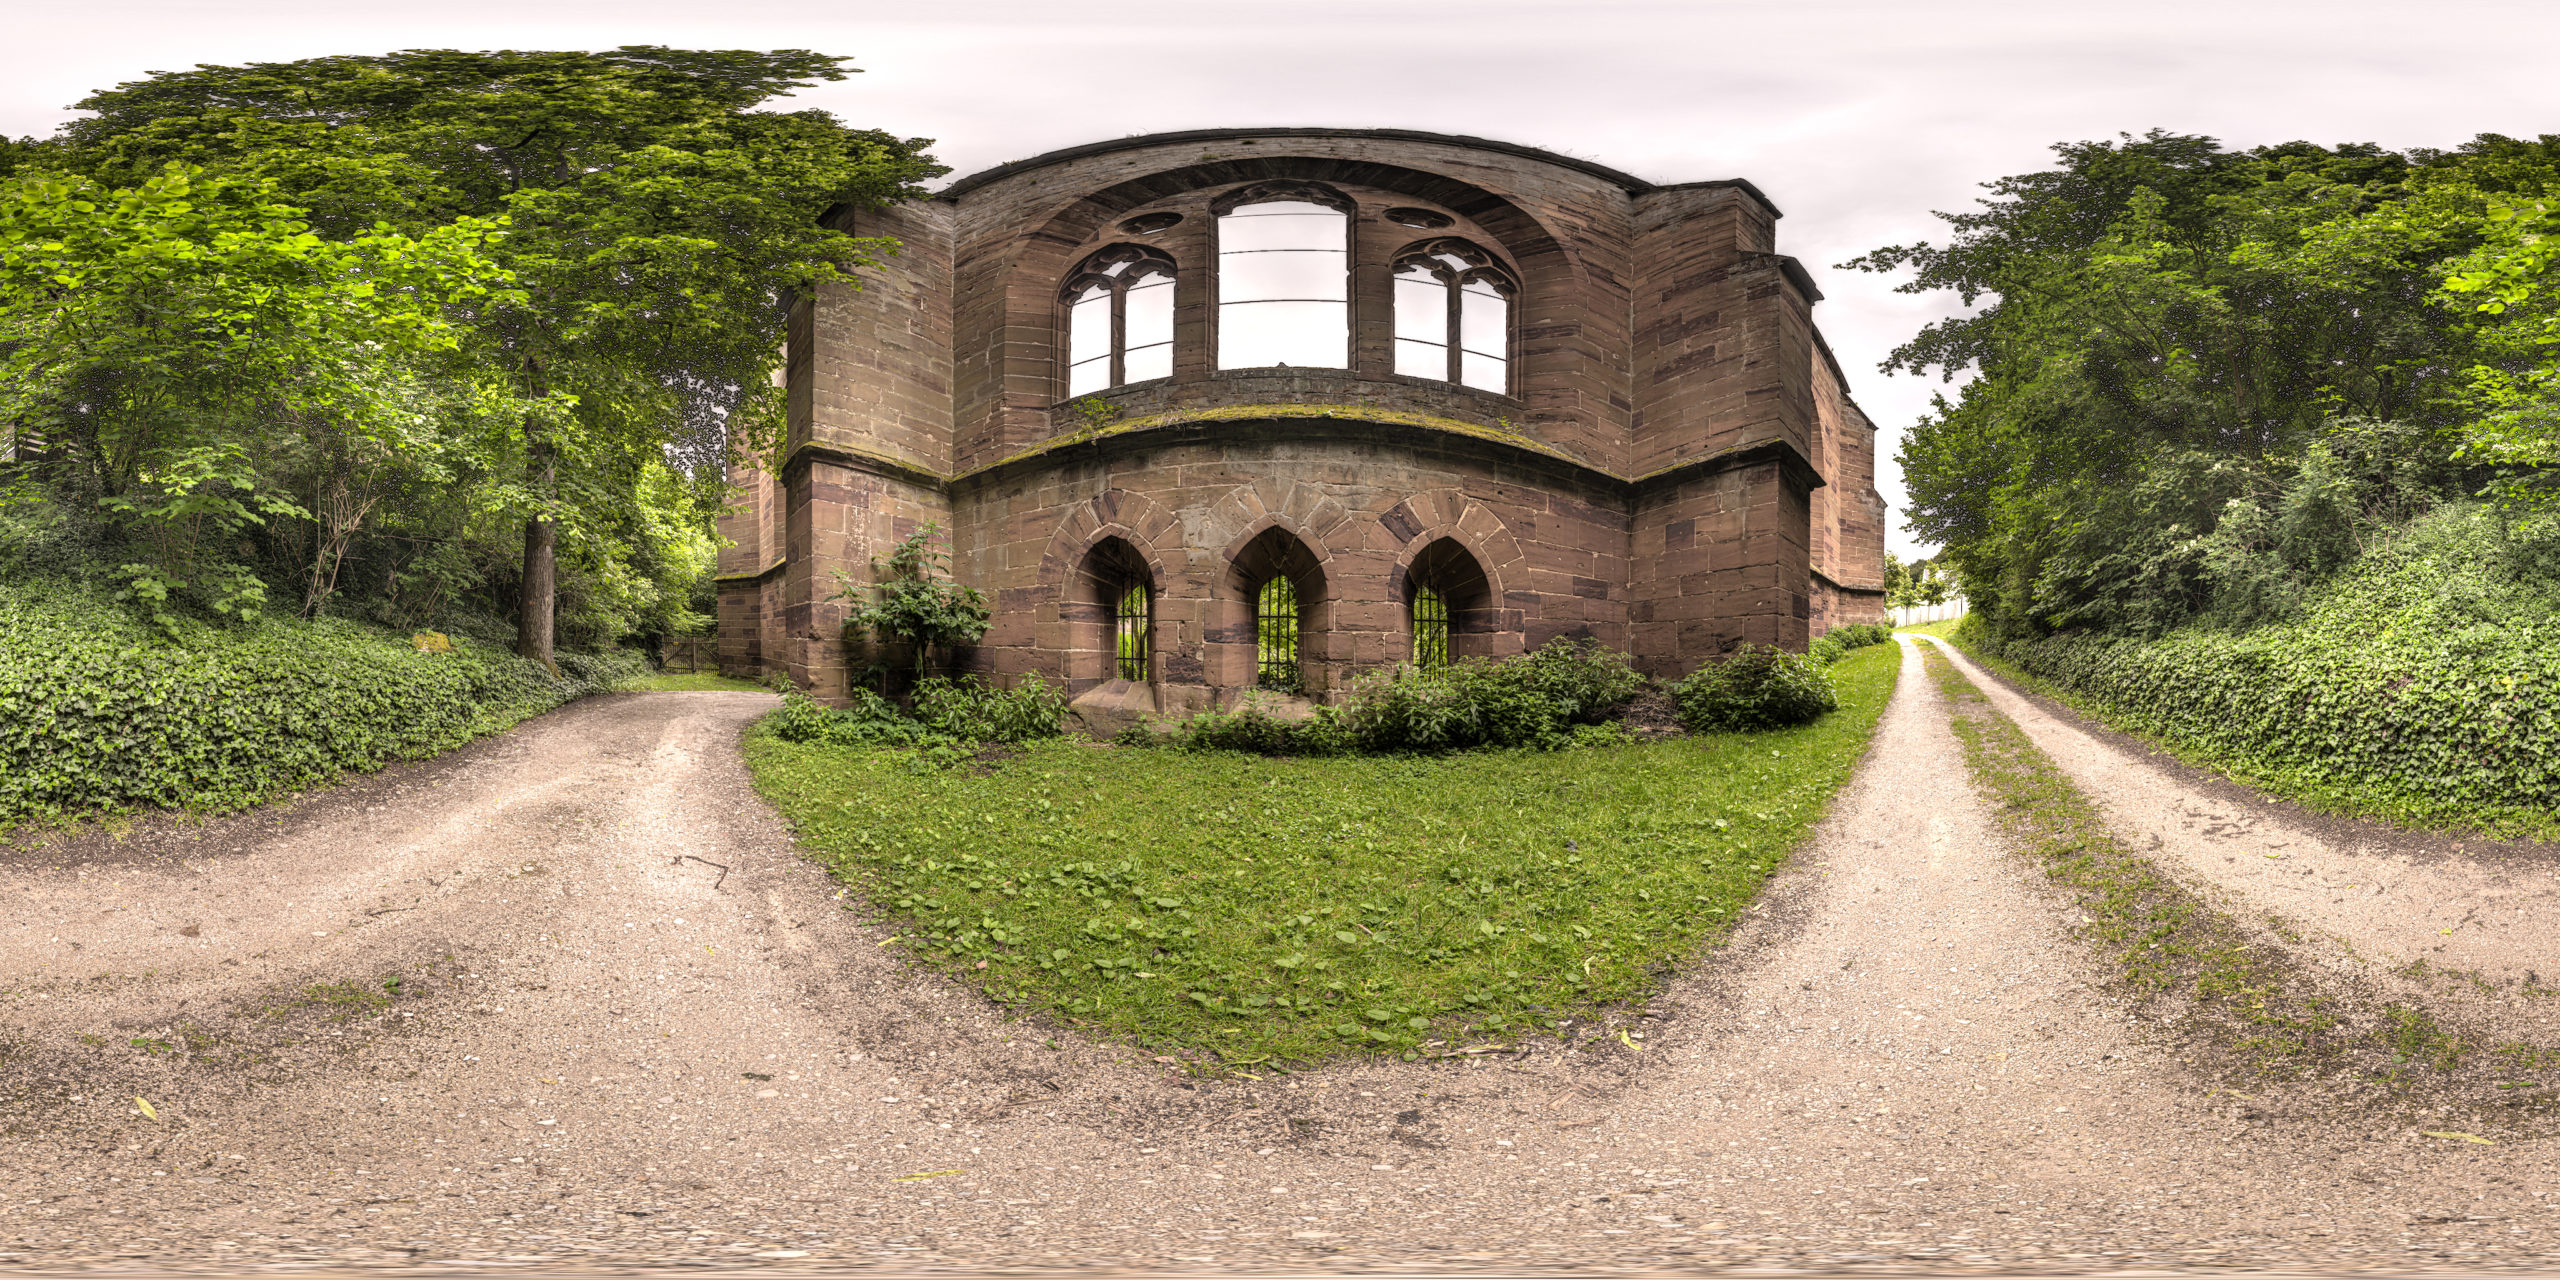 HDRI-Skies-Monastery-Ruins-Gnadenberg-Berg-Bei-Neumarkt